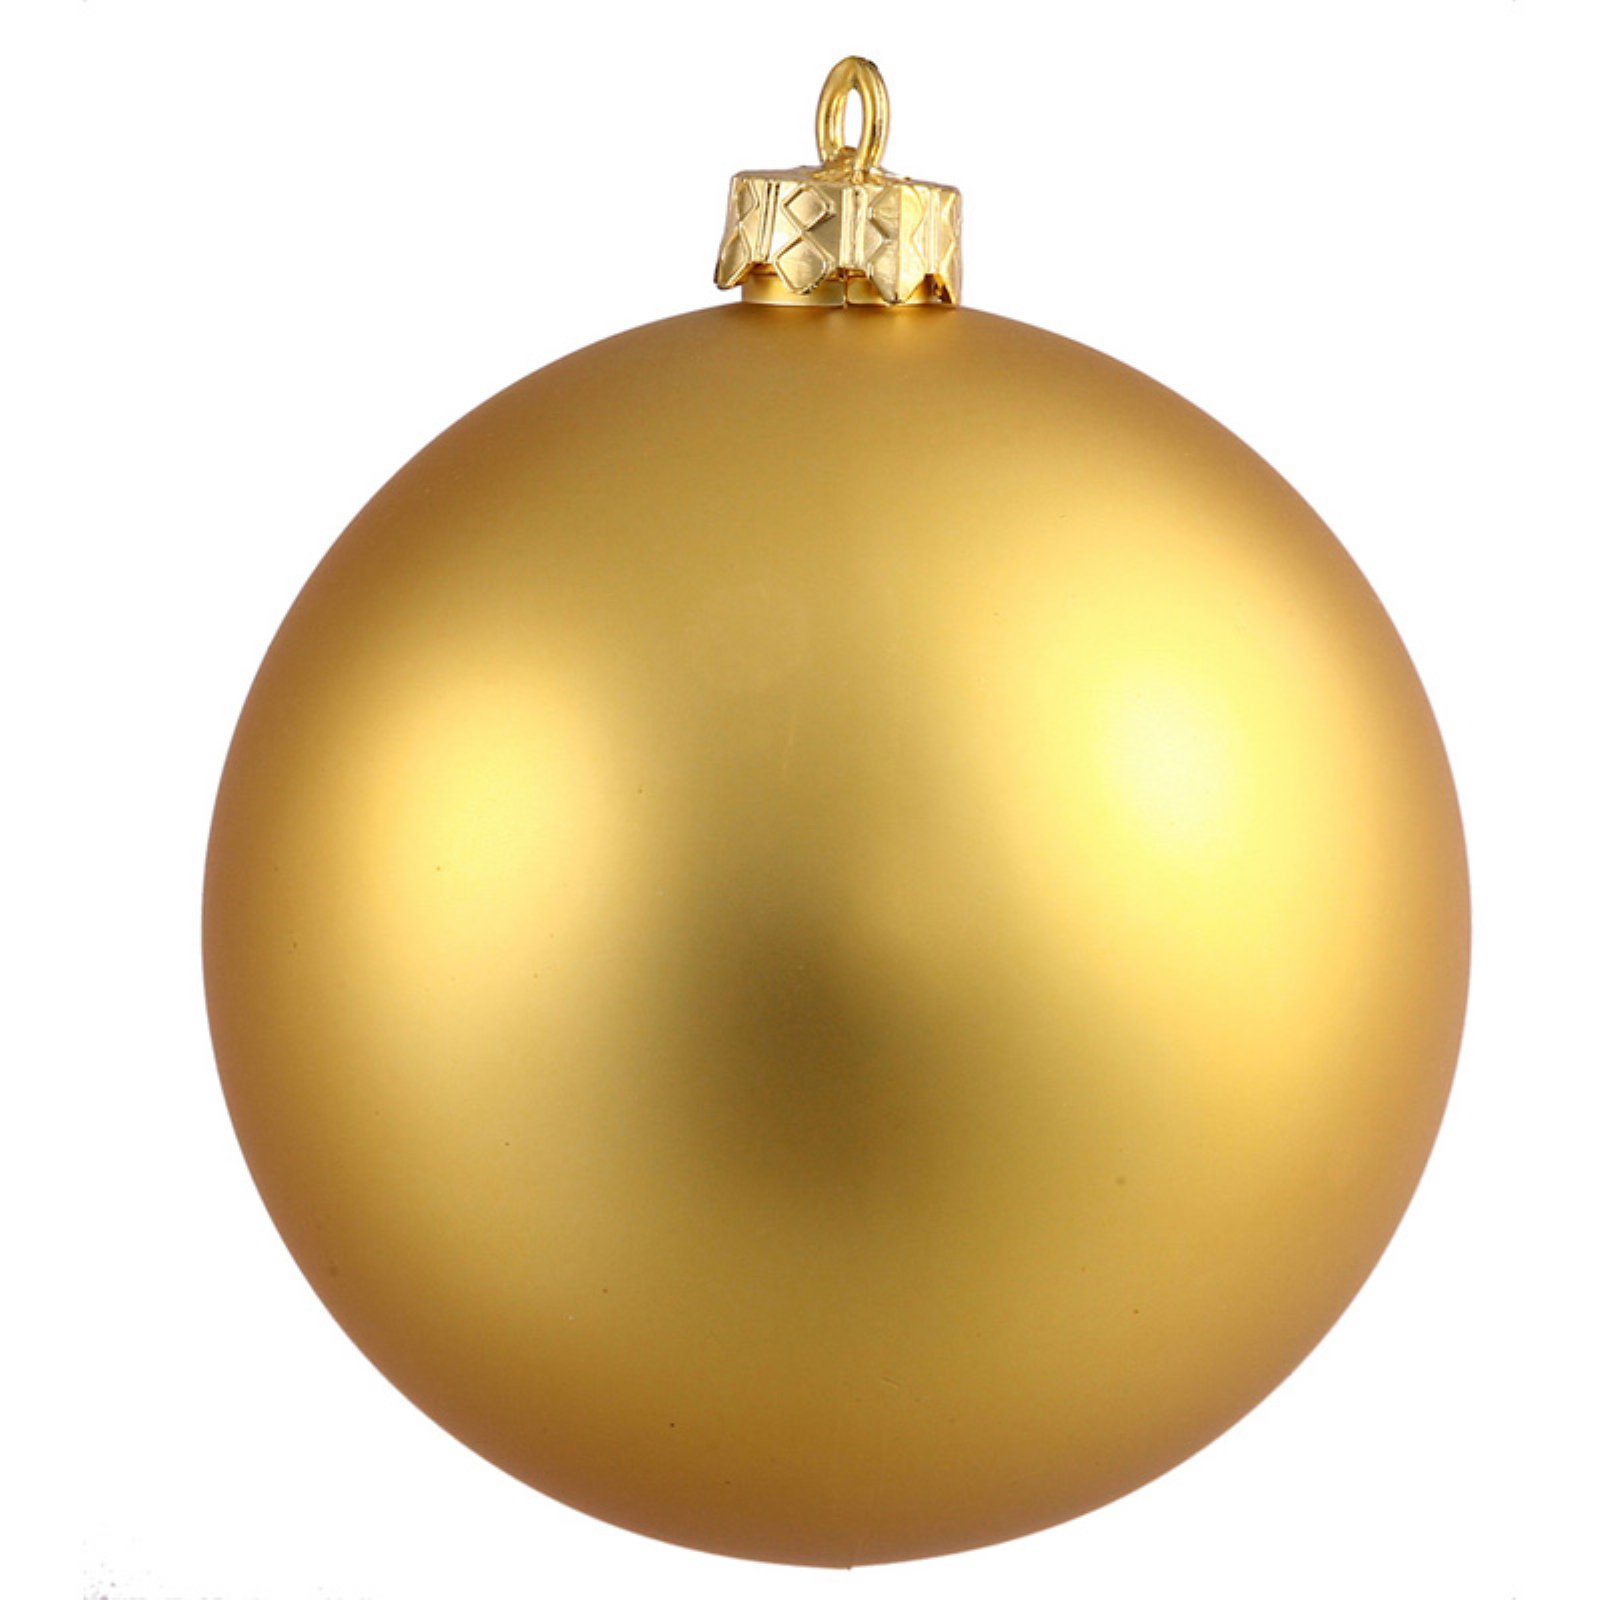 "Vickerman 2.4"" Ball Christmas Ornaments, Pack of 12"